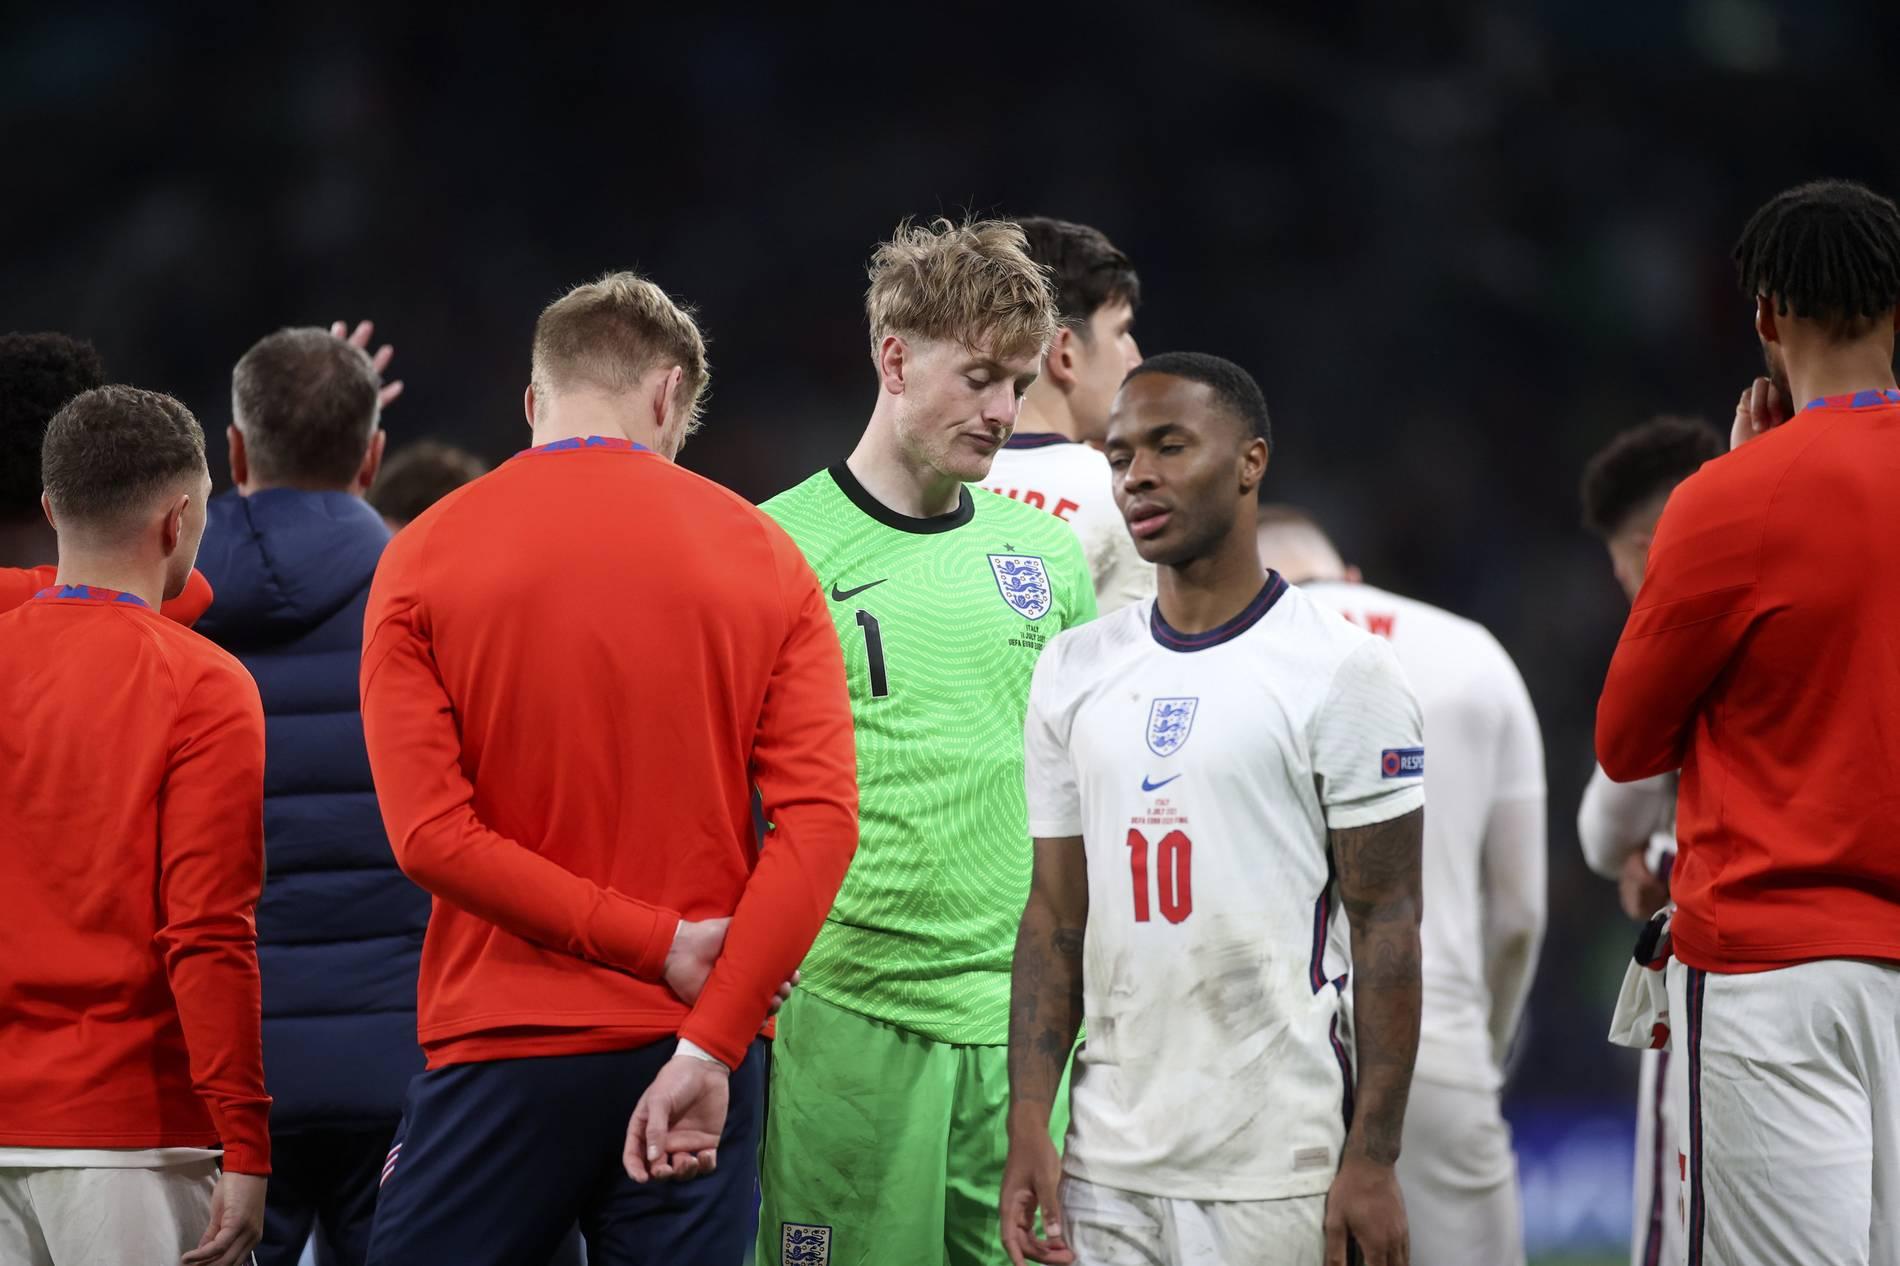 EM 20 Pressestimmen zum Finale gegen Italien   England trauert